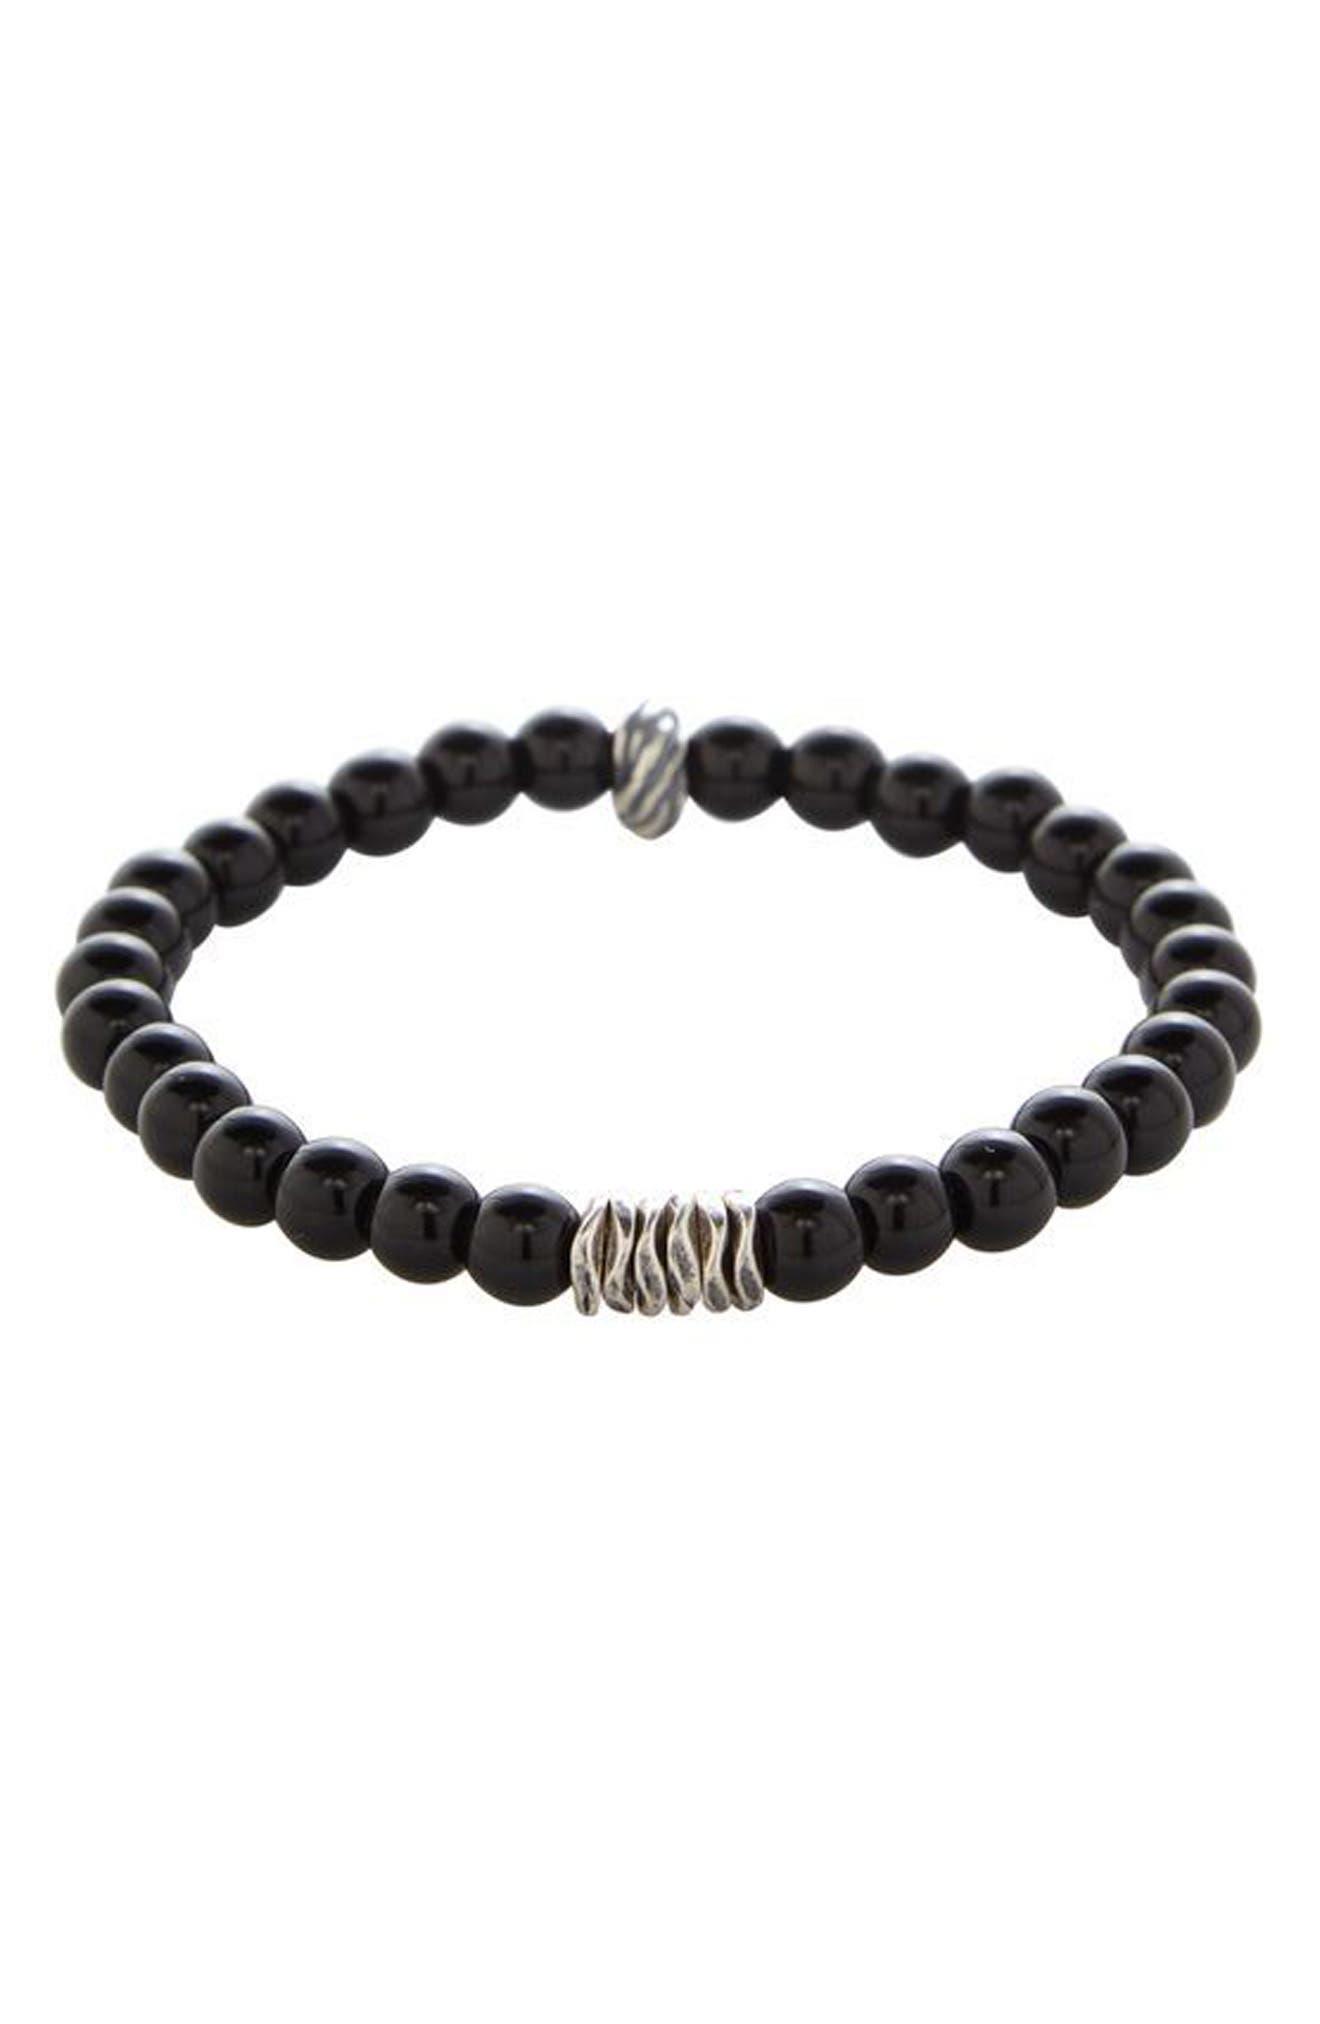 Alternate Image 1 Selected - Degs & Sal Onyx Bead Bracelet